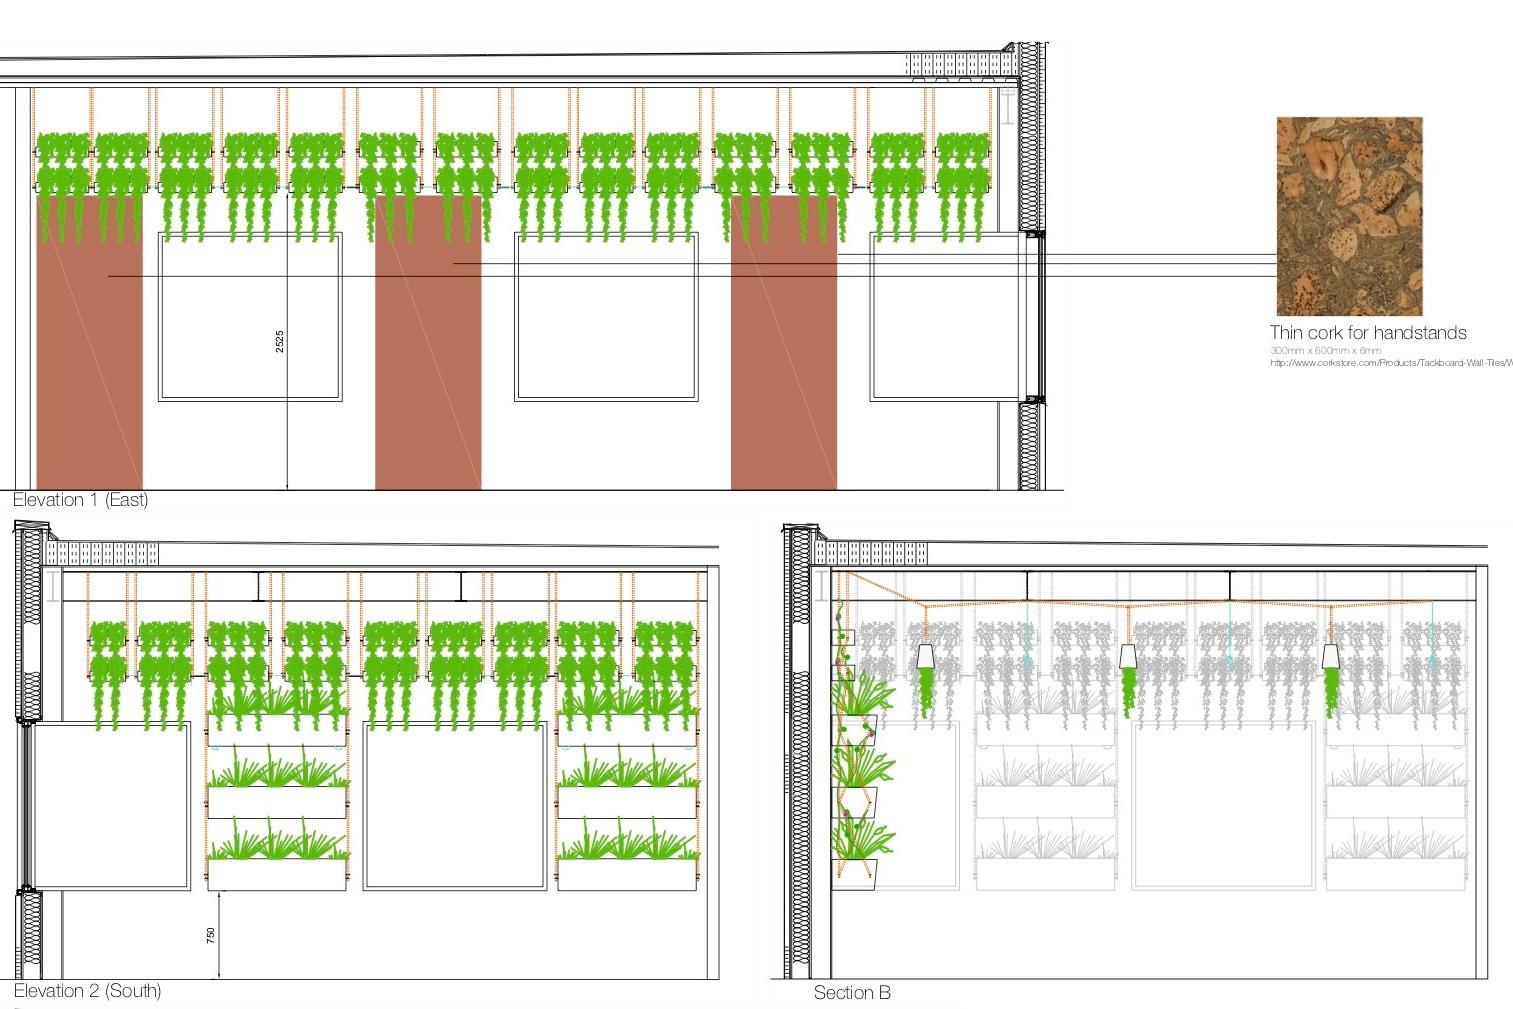 biofit gym design lily jencks.jpg